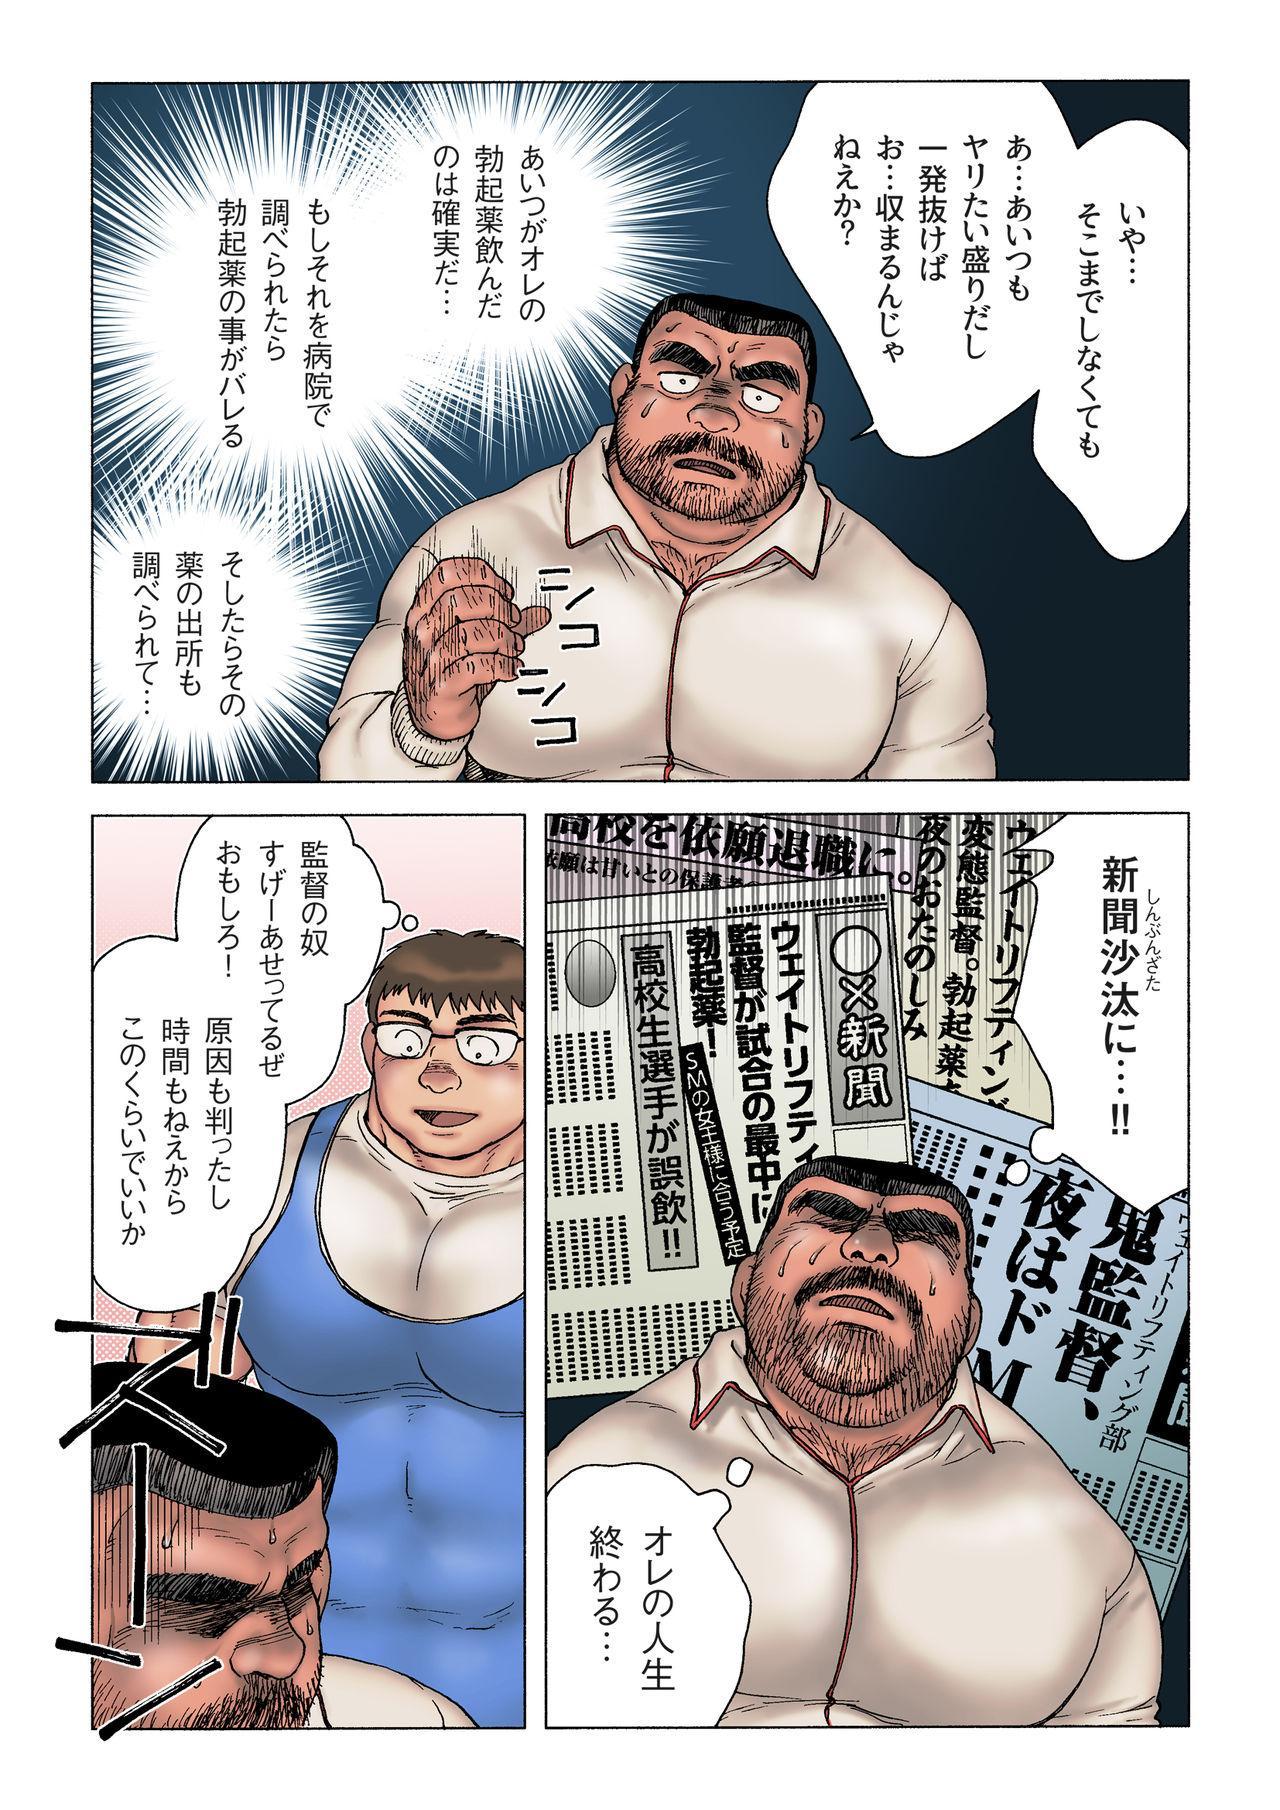 Danshi Koukousei Weightlifter Shiai-chuu, Osae kirenai Wakai Takeri 16